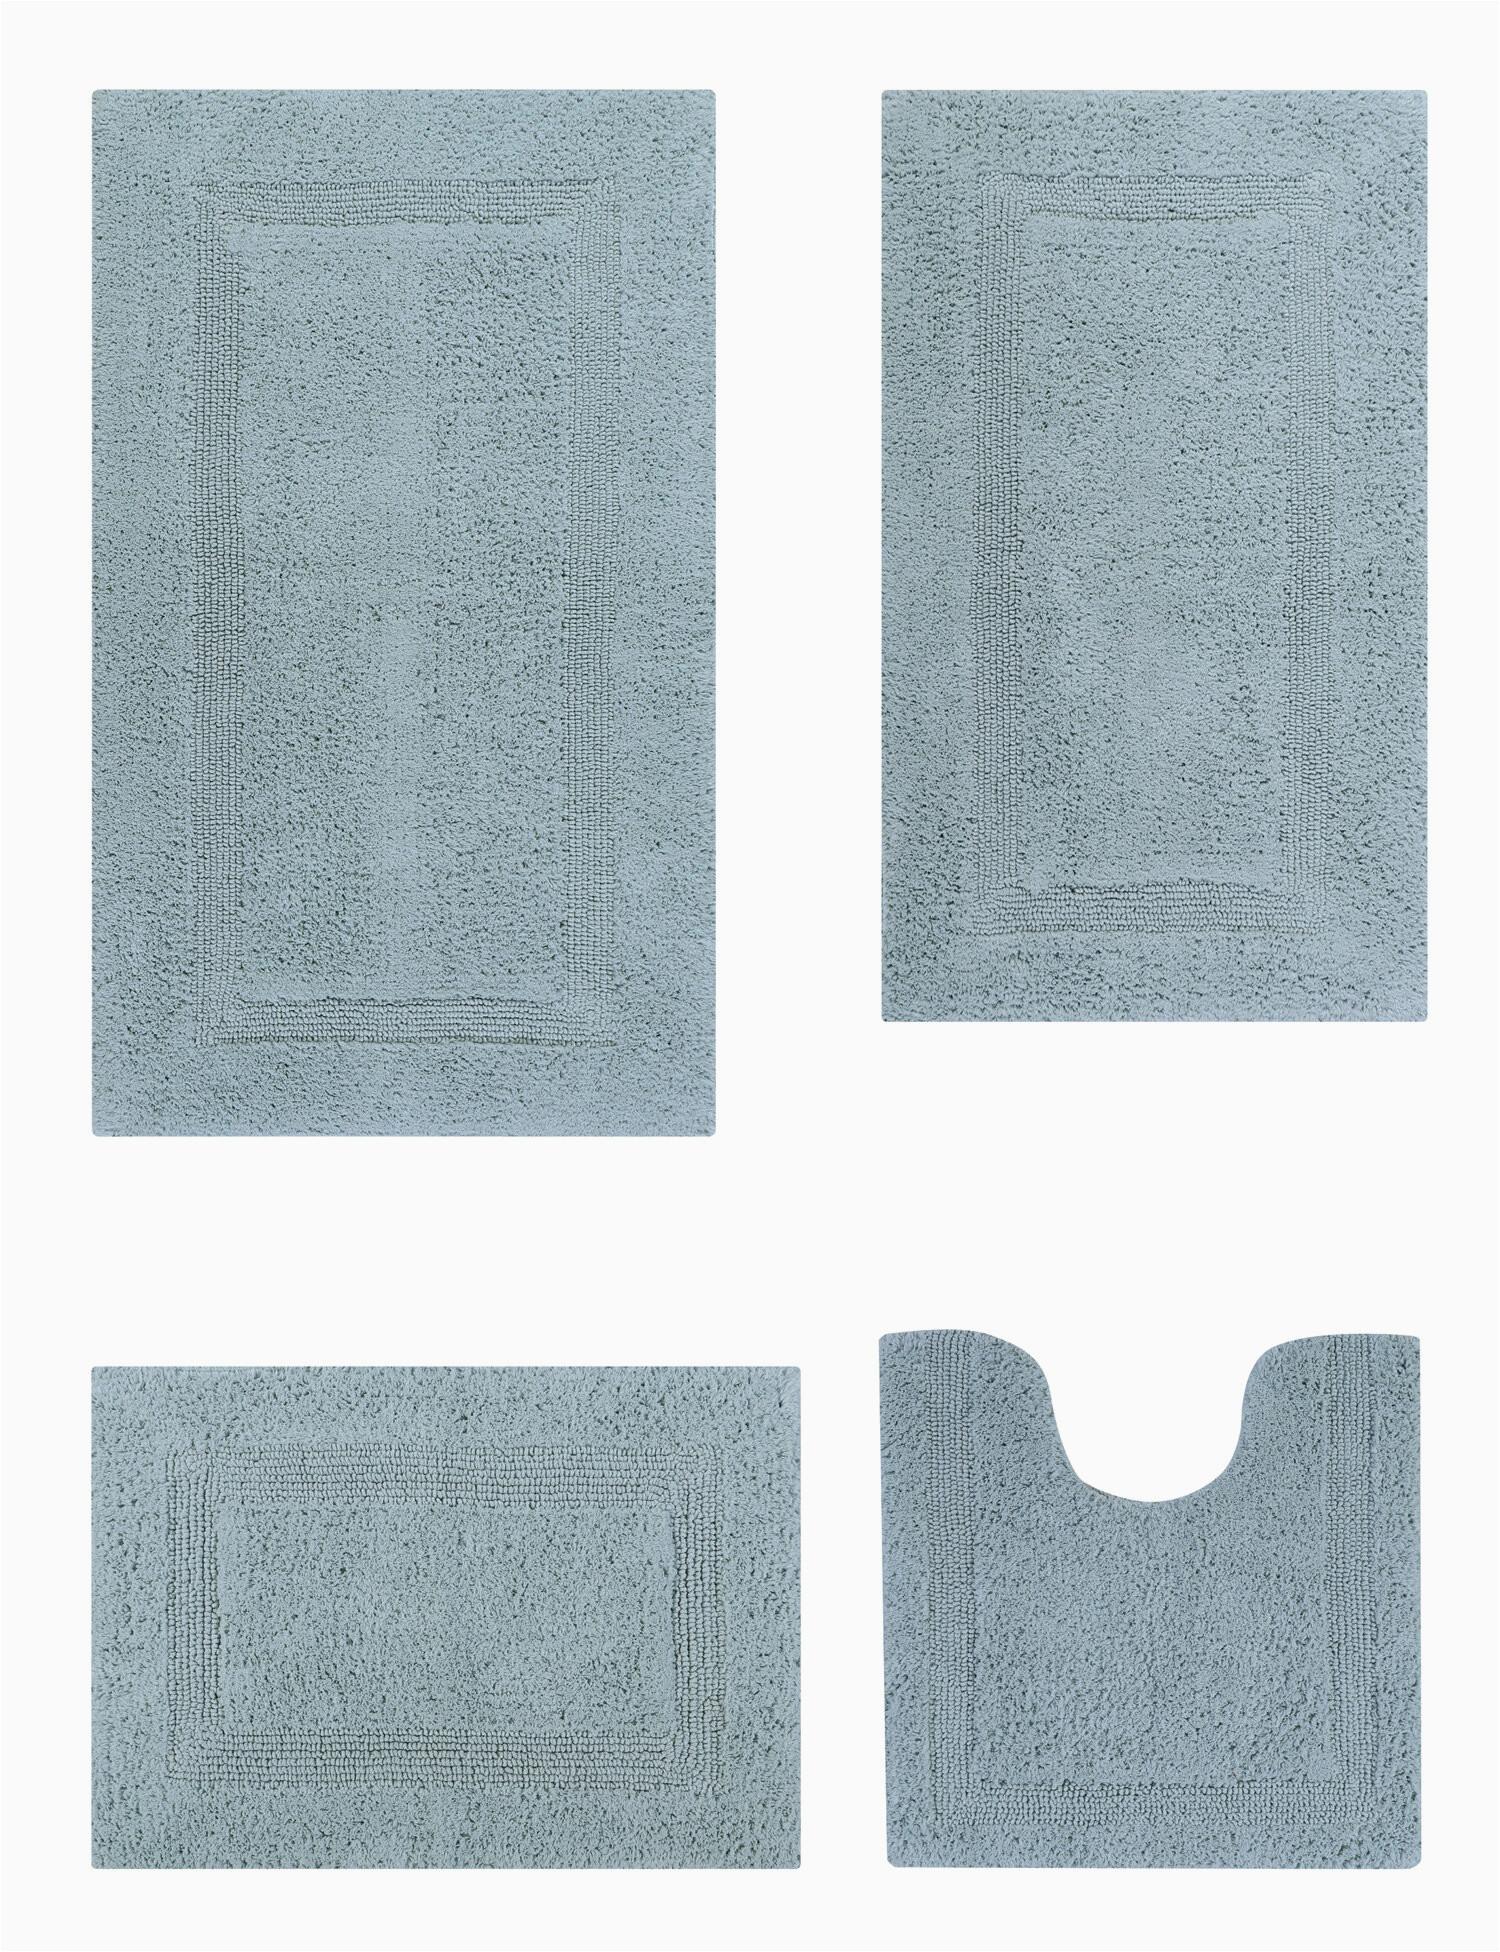 ebern designs 4 piece adelen ultra soft plush and absorbent 100 cotton bath rug set w004267929